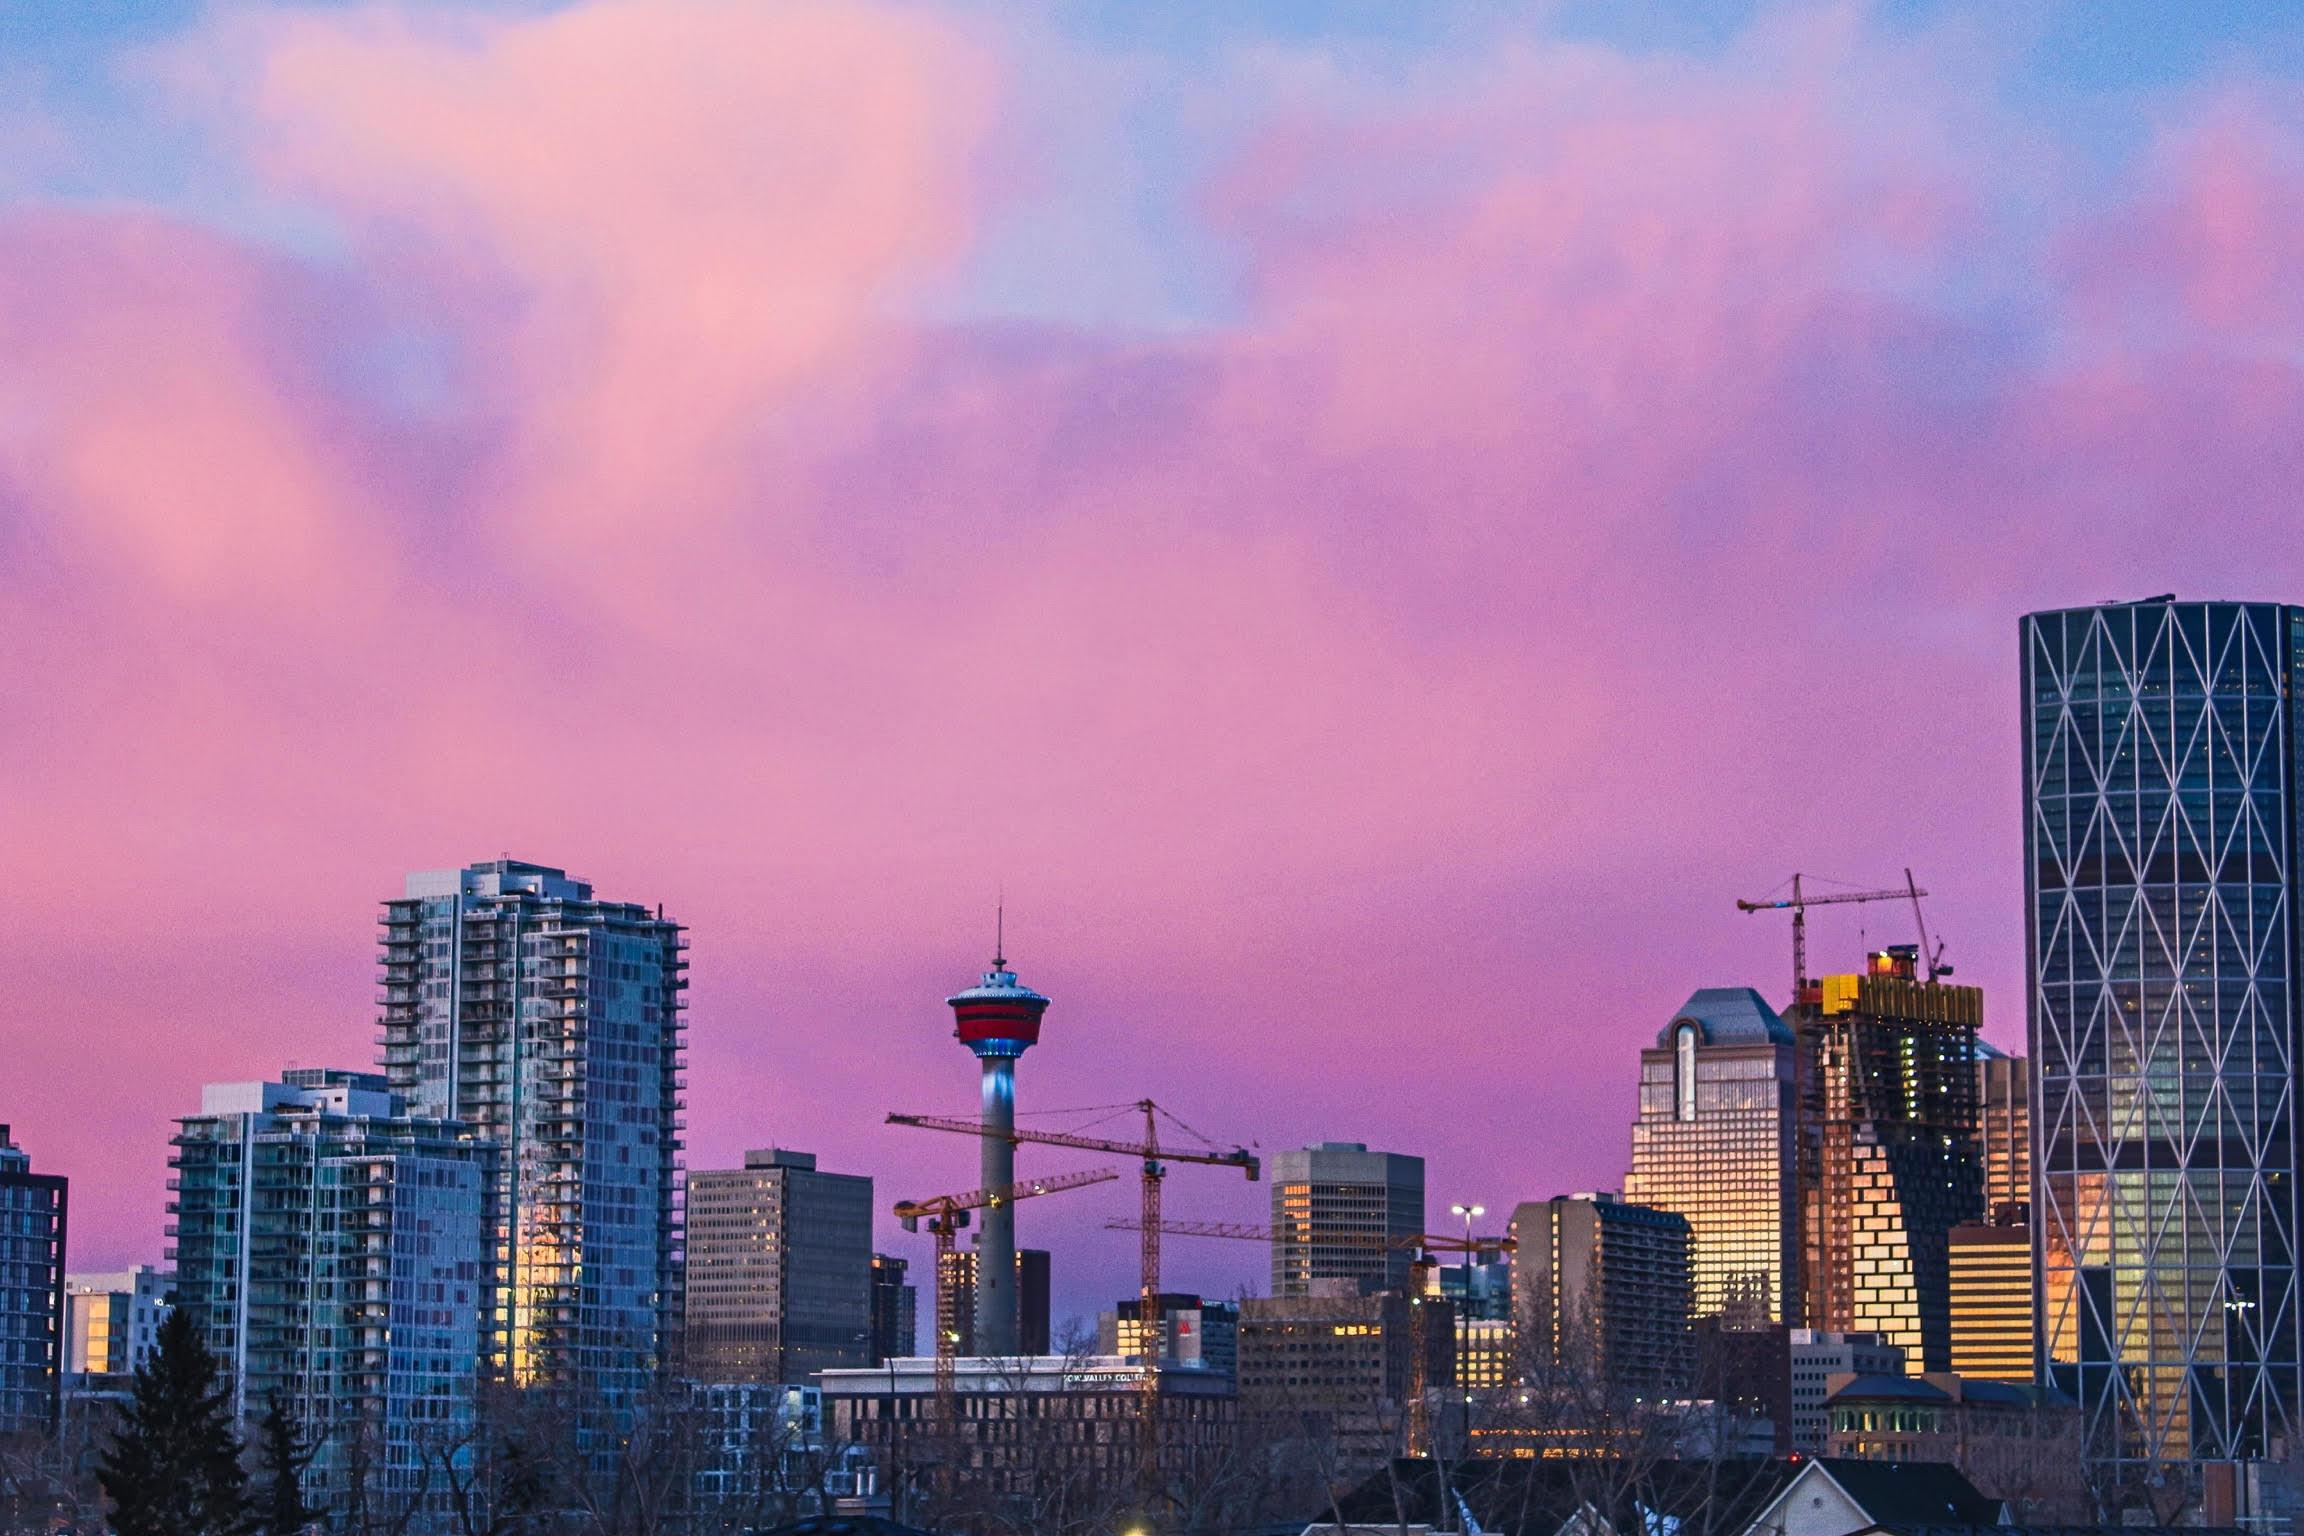 Sunset over downtown Calgary. Image credit Simon Greenwood